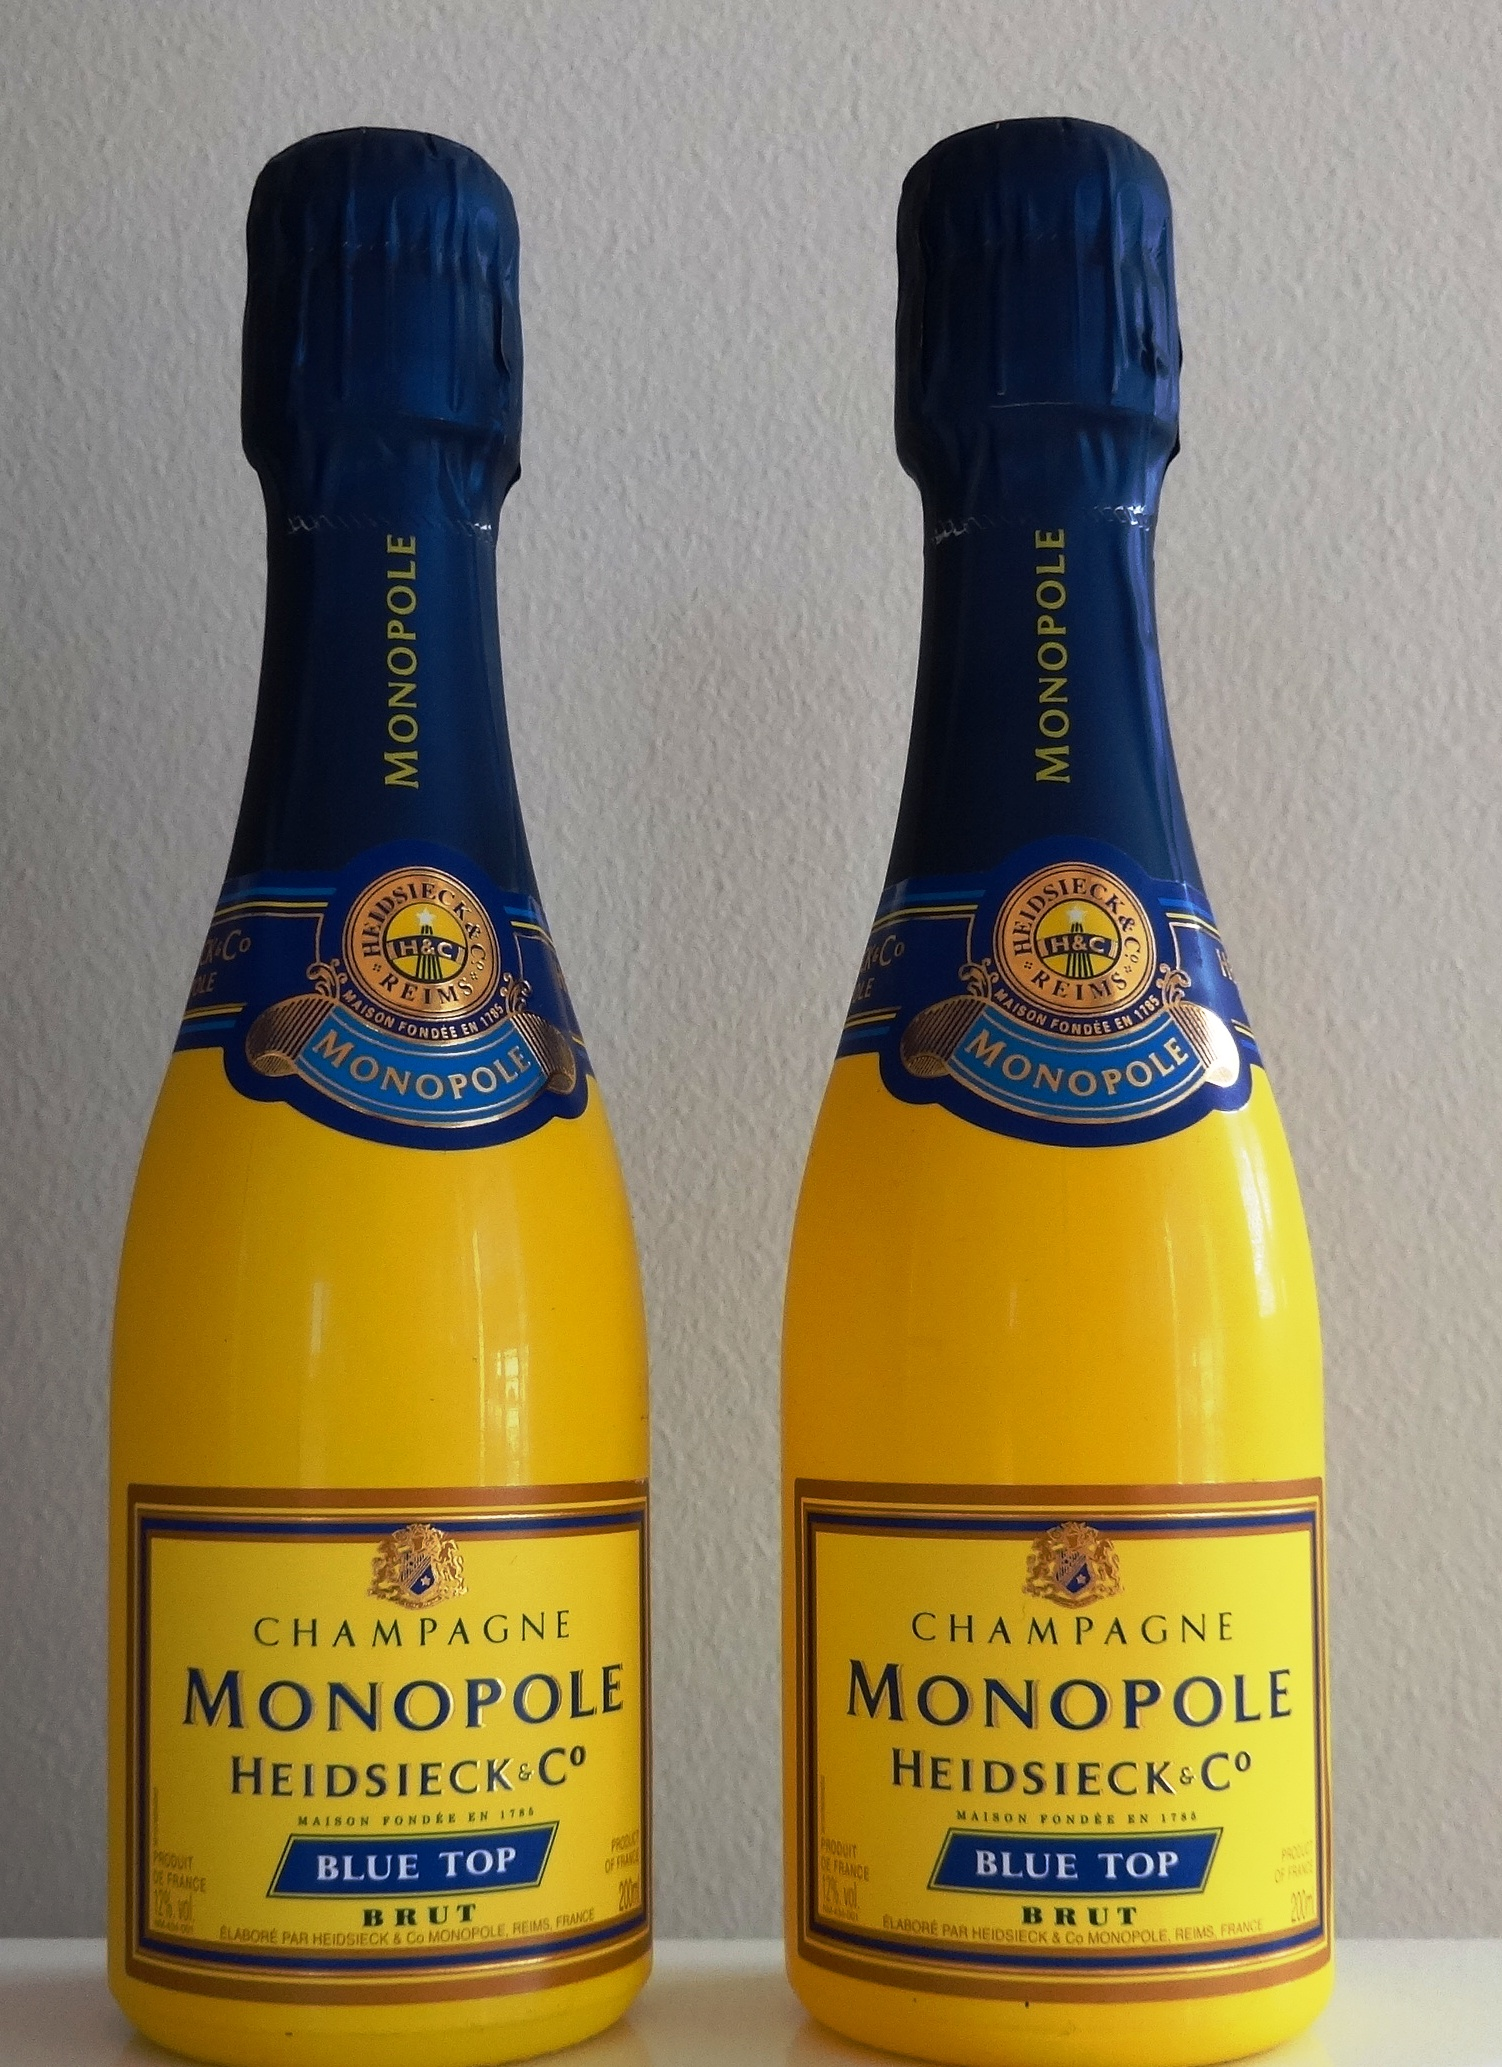 Charles Heidsieck Champagne Brut Blue Top Monopole